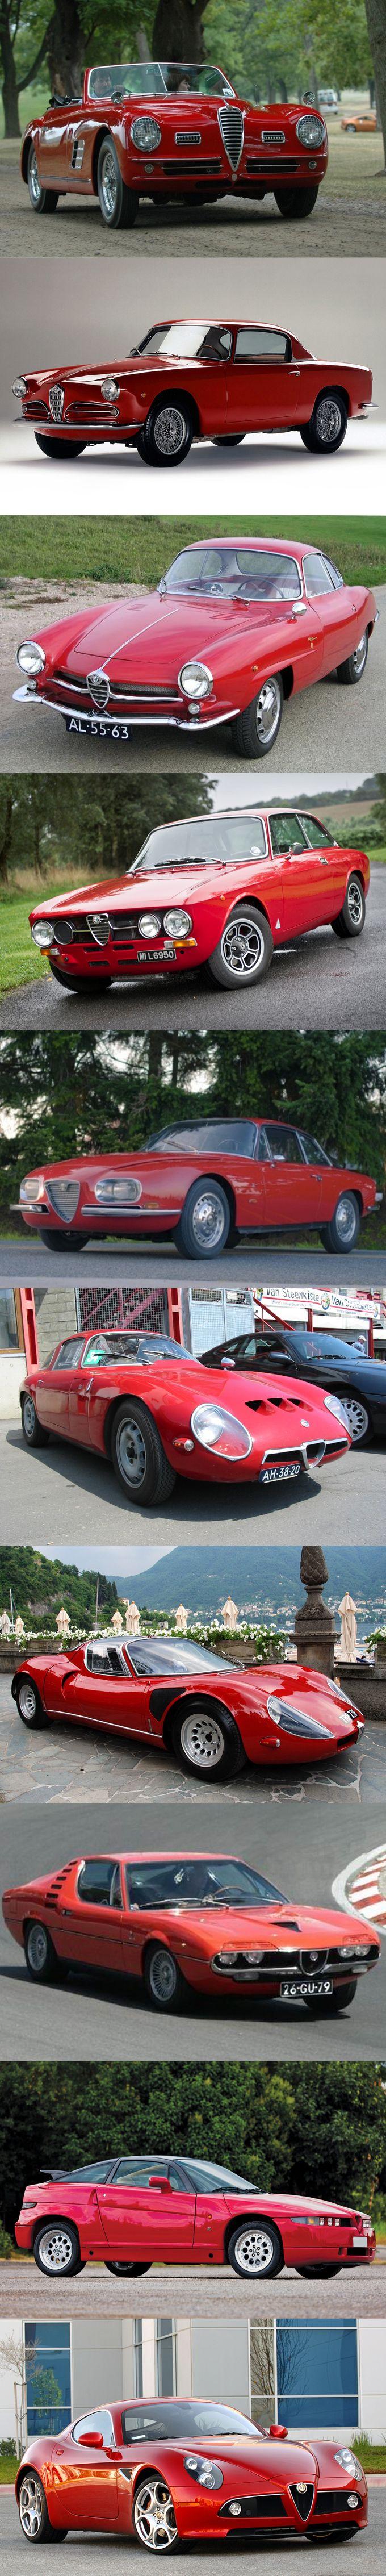 207 best cars images on Pinterest